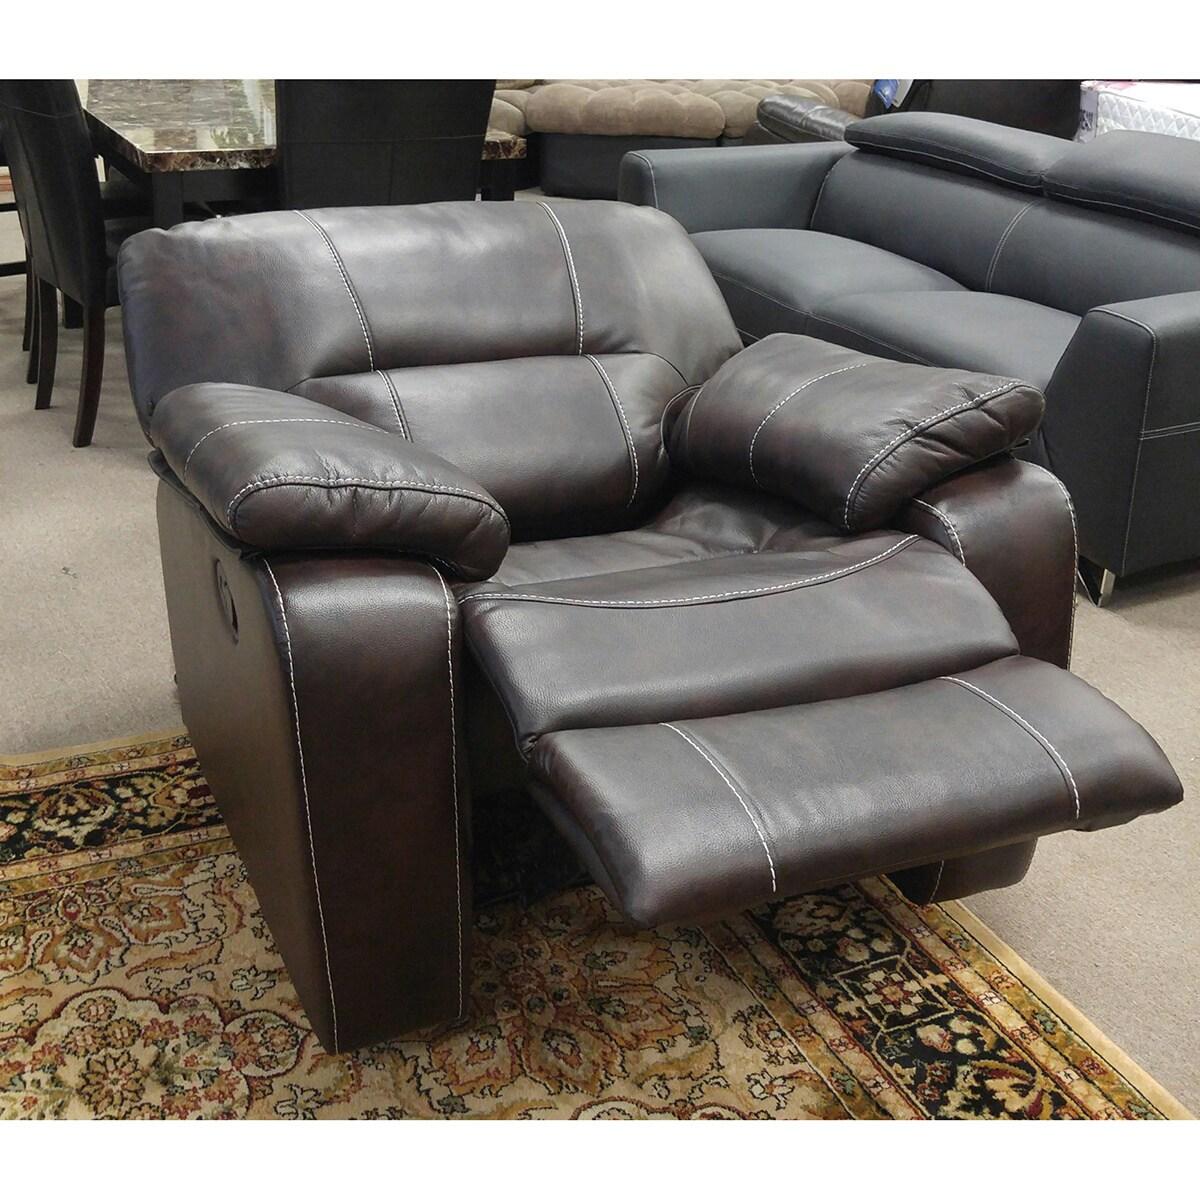 Shop Silverado Modern Printed Leather Reclining Chair